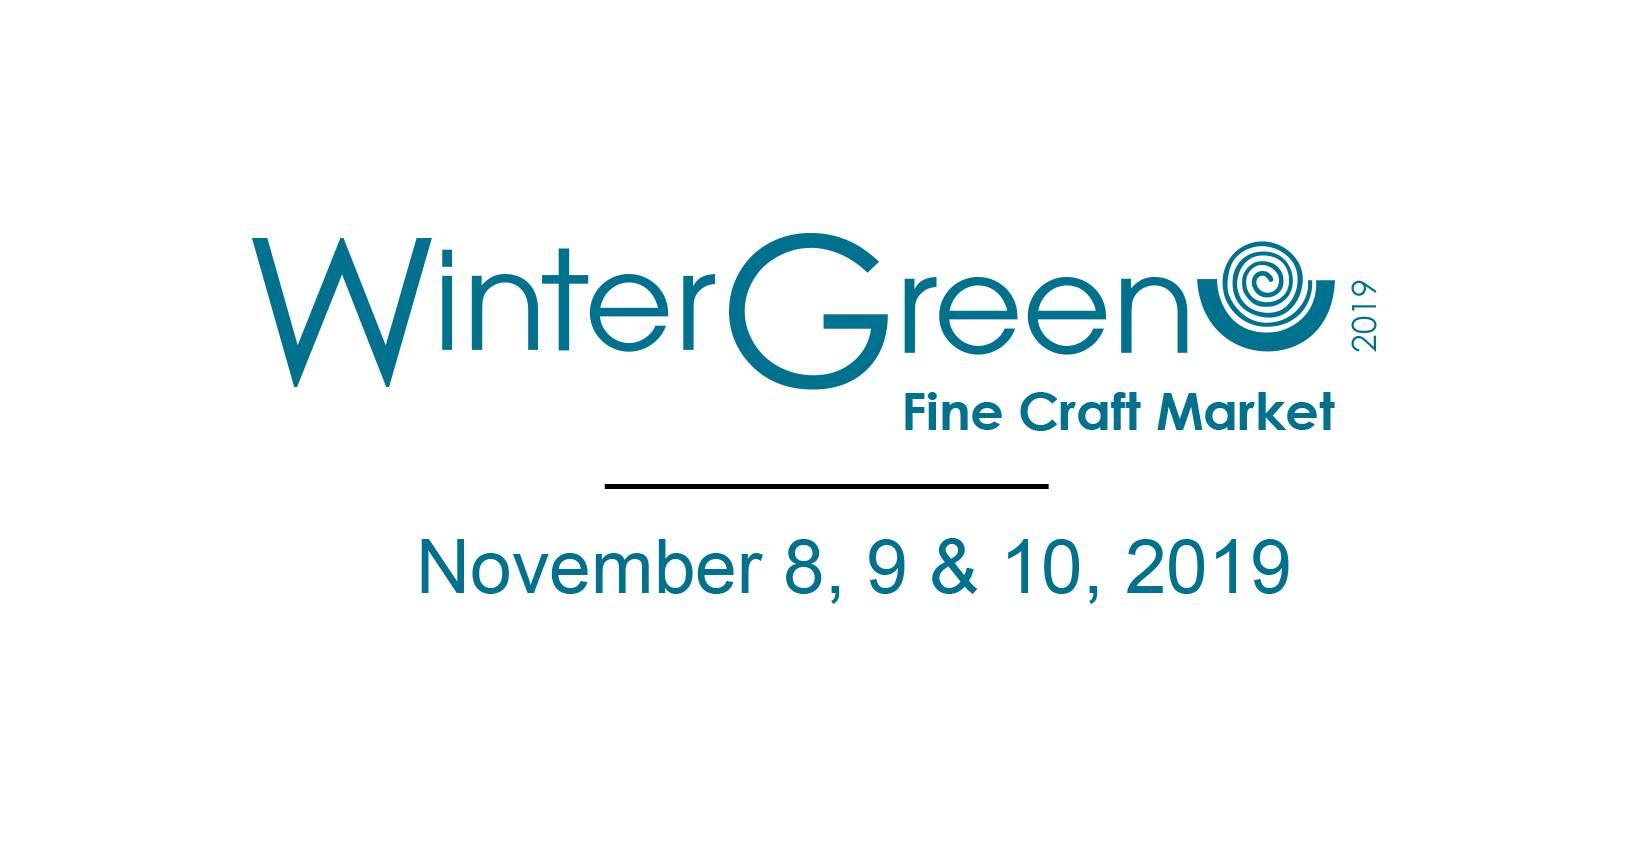 2019-11-Wintergreen Banner.jpg